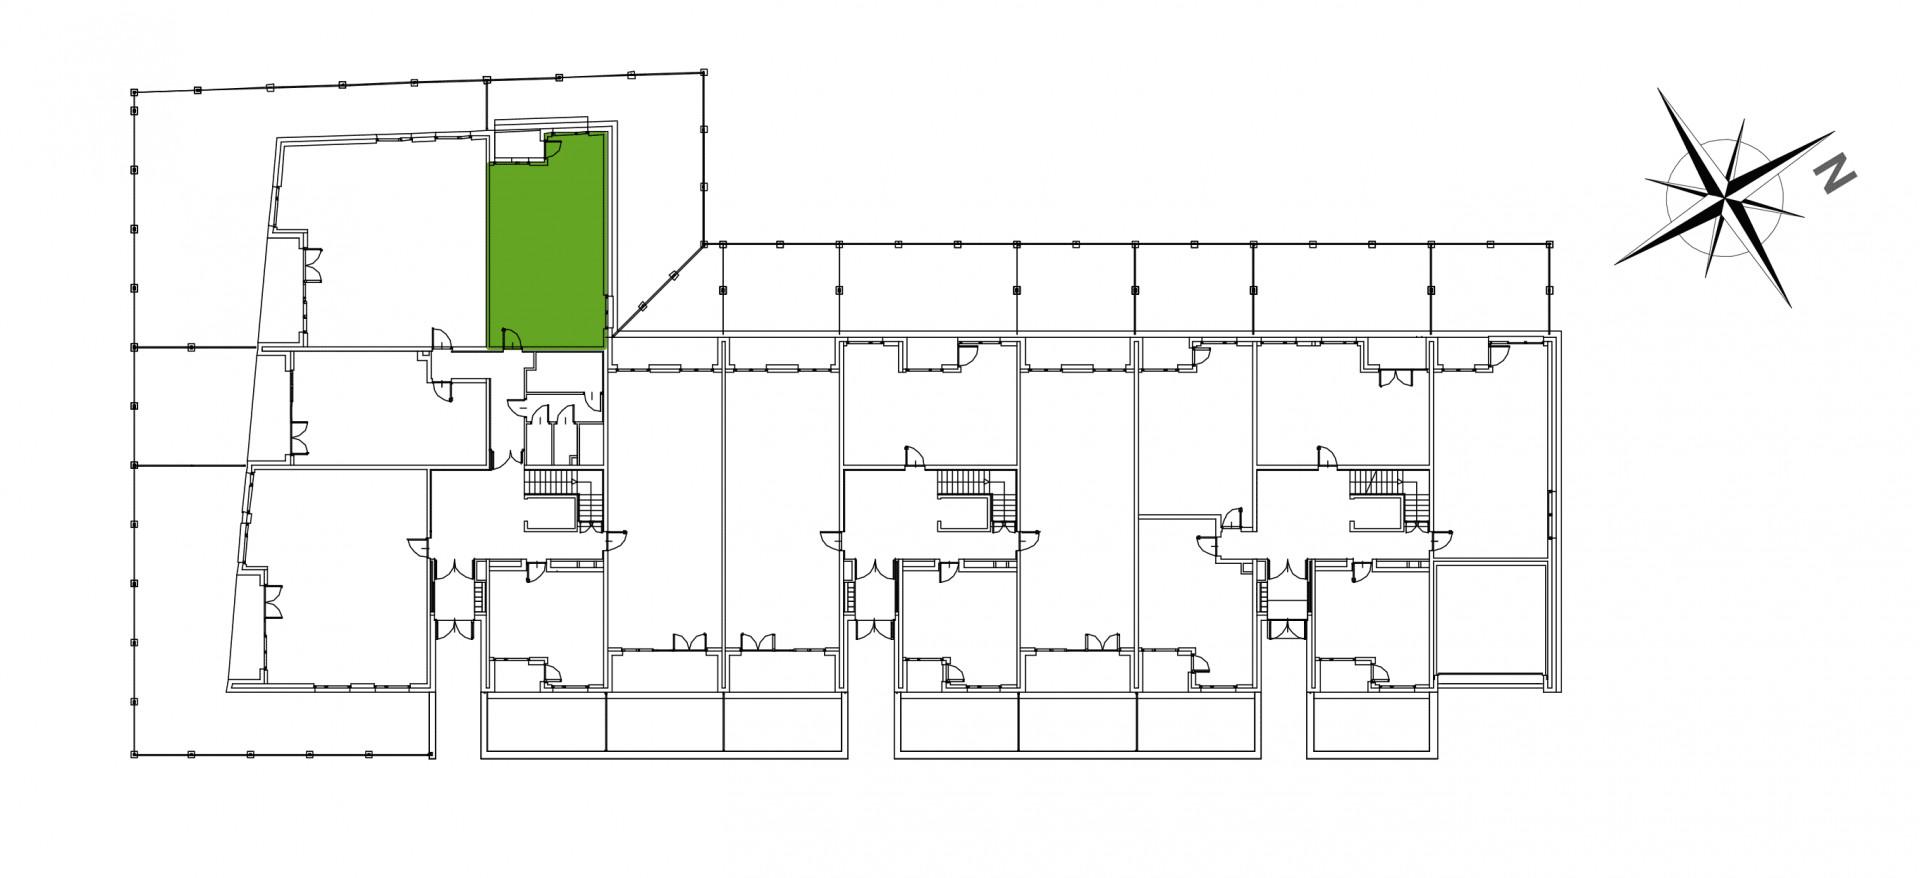 Mazowiecka 72 / apartament nr 47 rzut 2